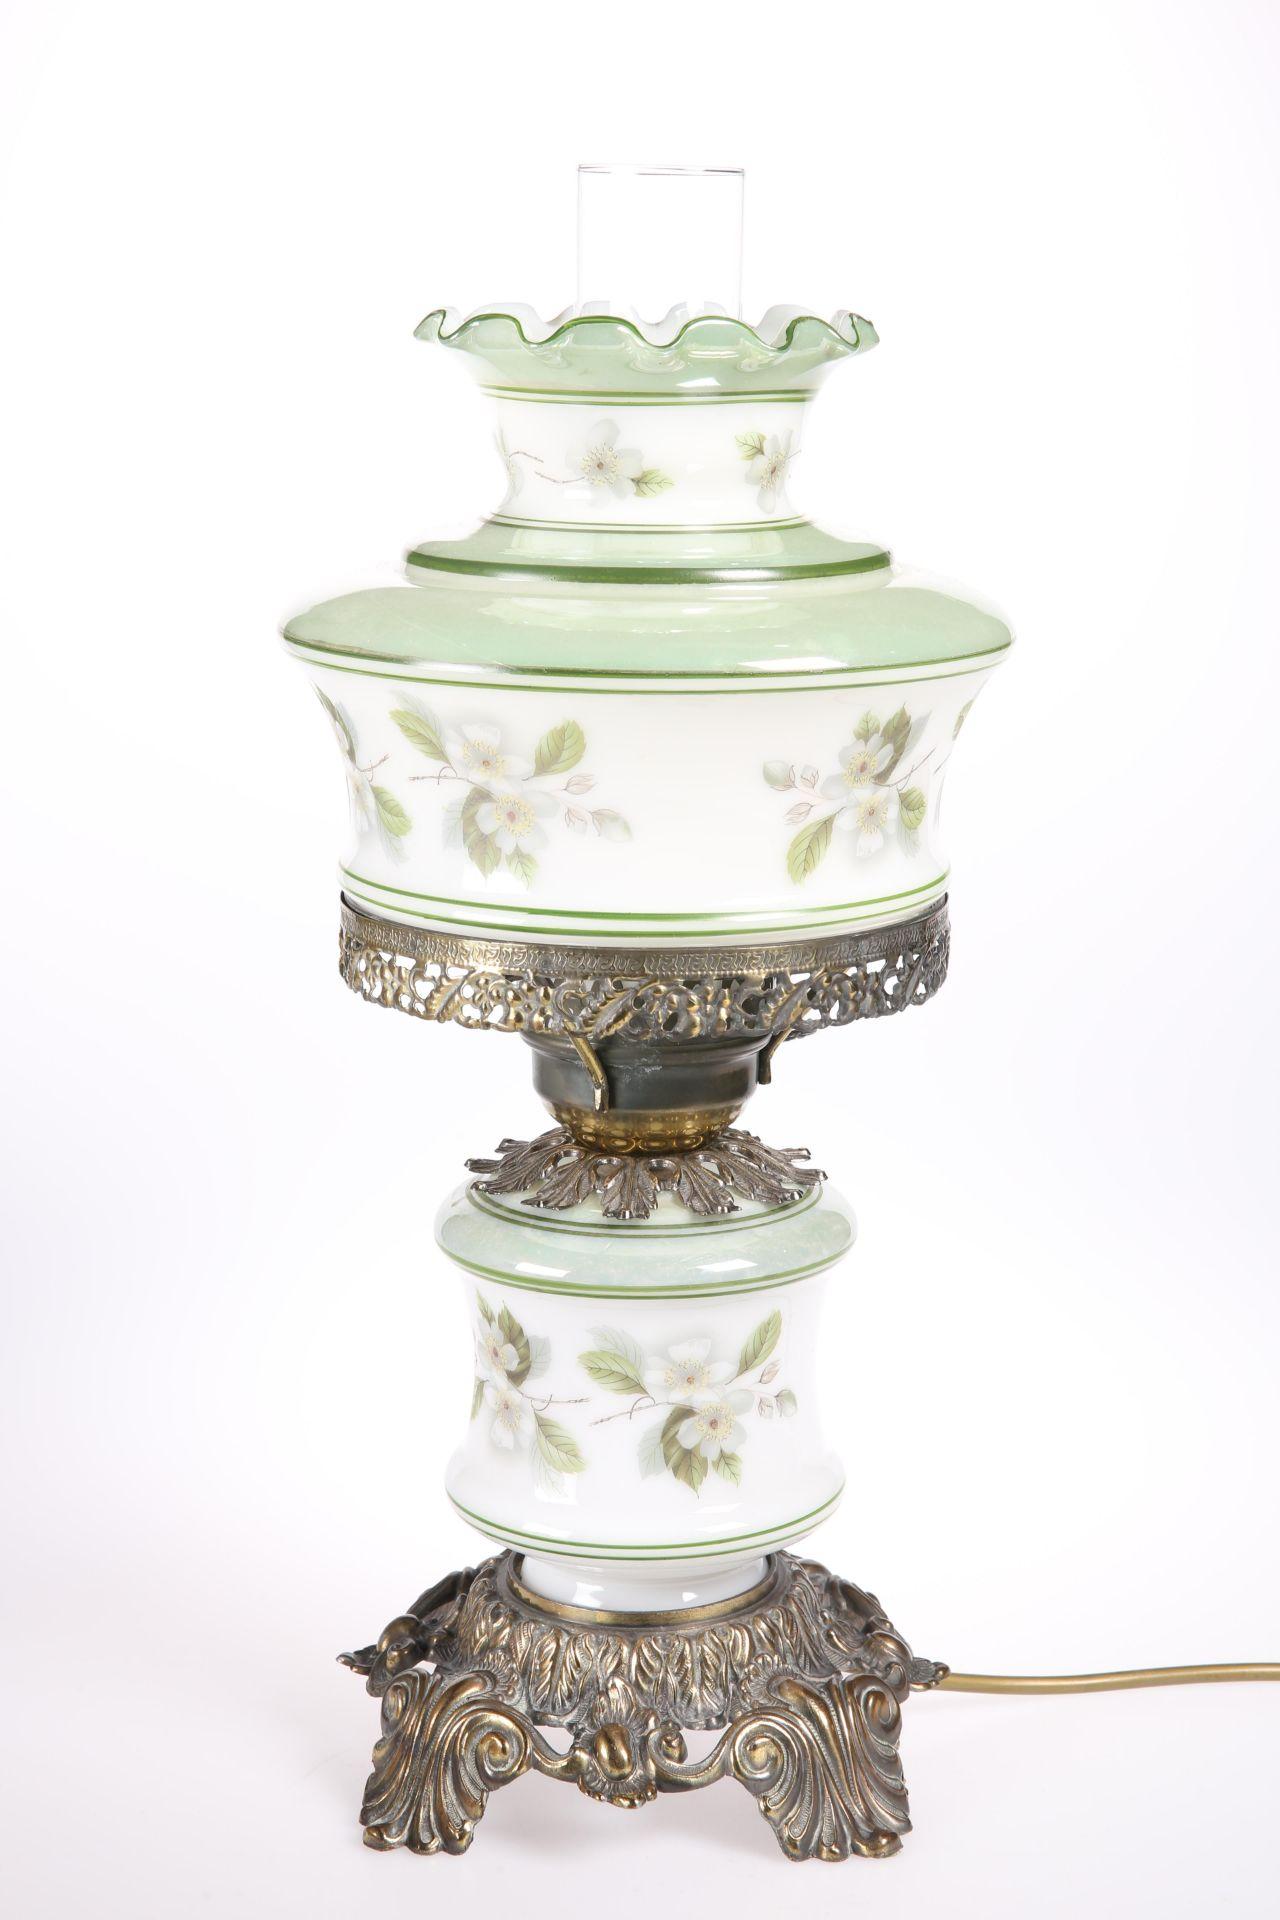 A QUOIZEL ABIGAIL ADAMS BRASS-MOUNTED GLASS HURRICANE LAMP. 49cm